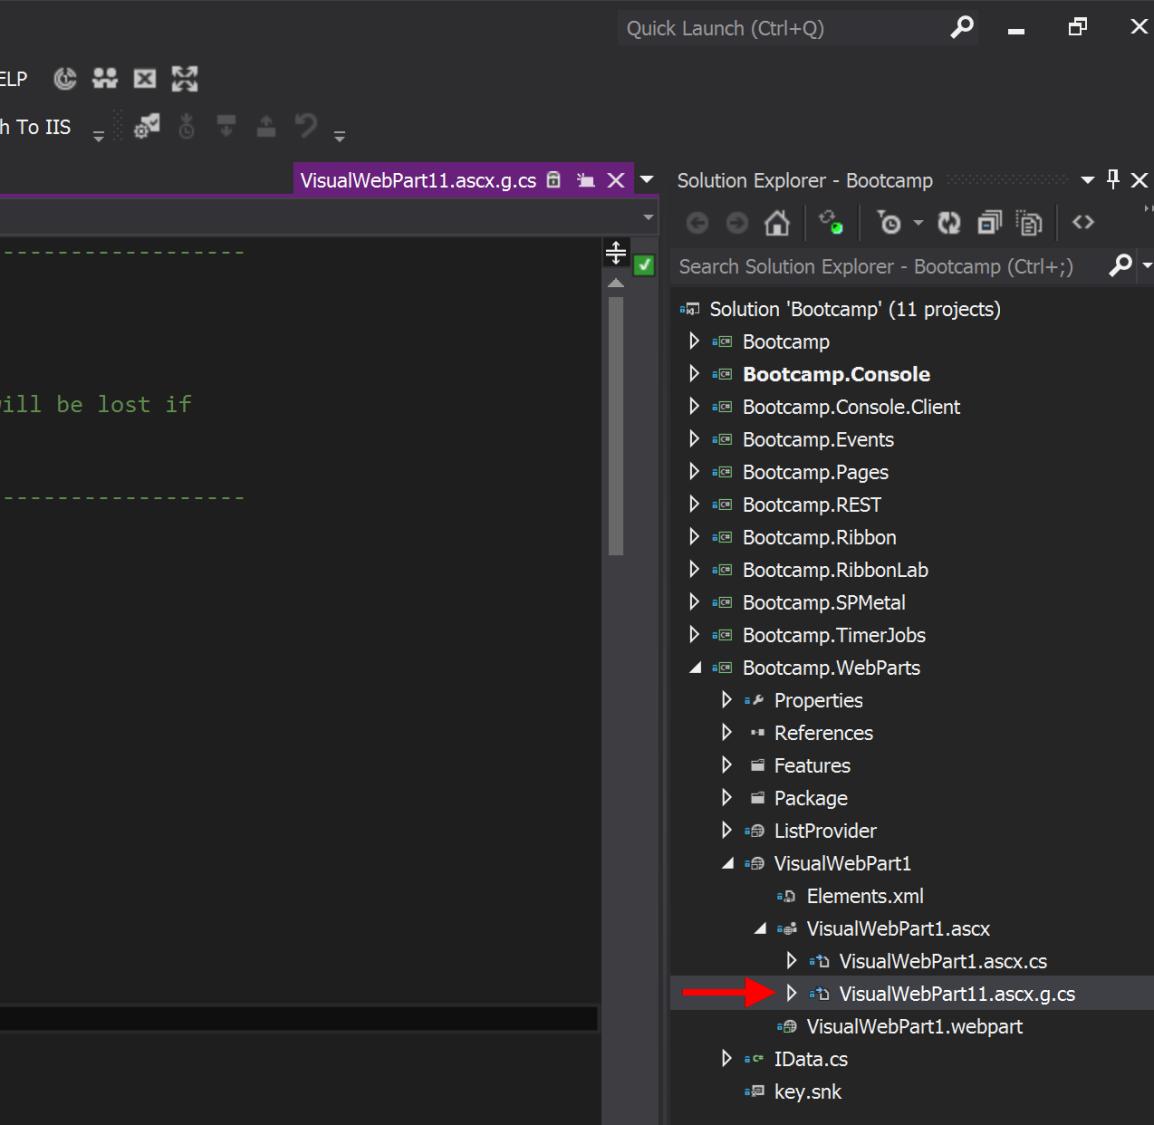 Missing Visual WebPart Designer File